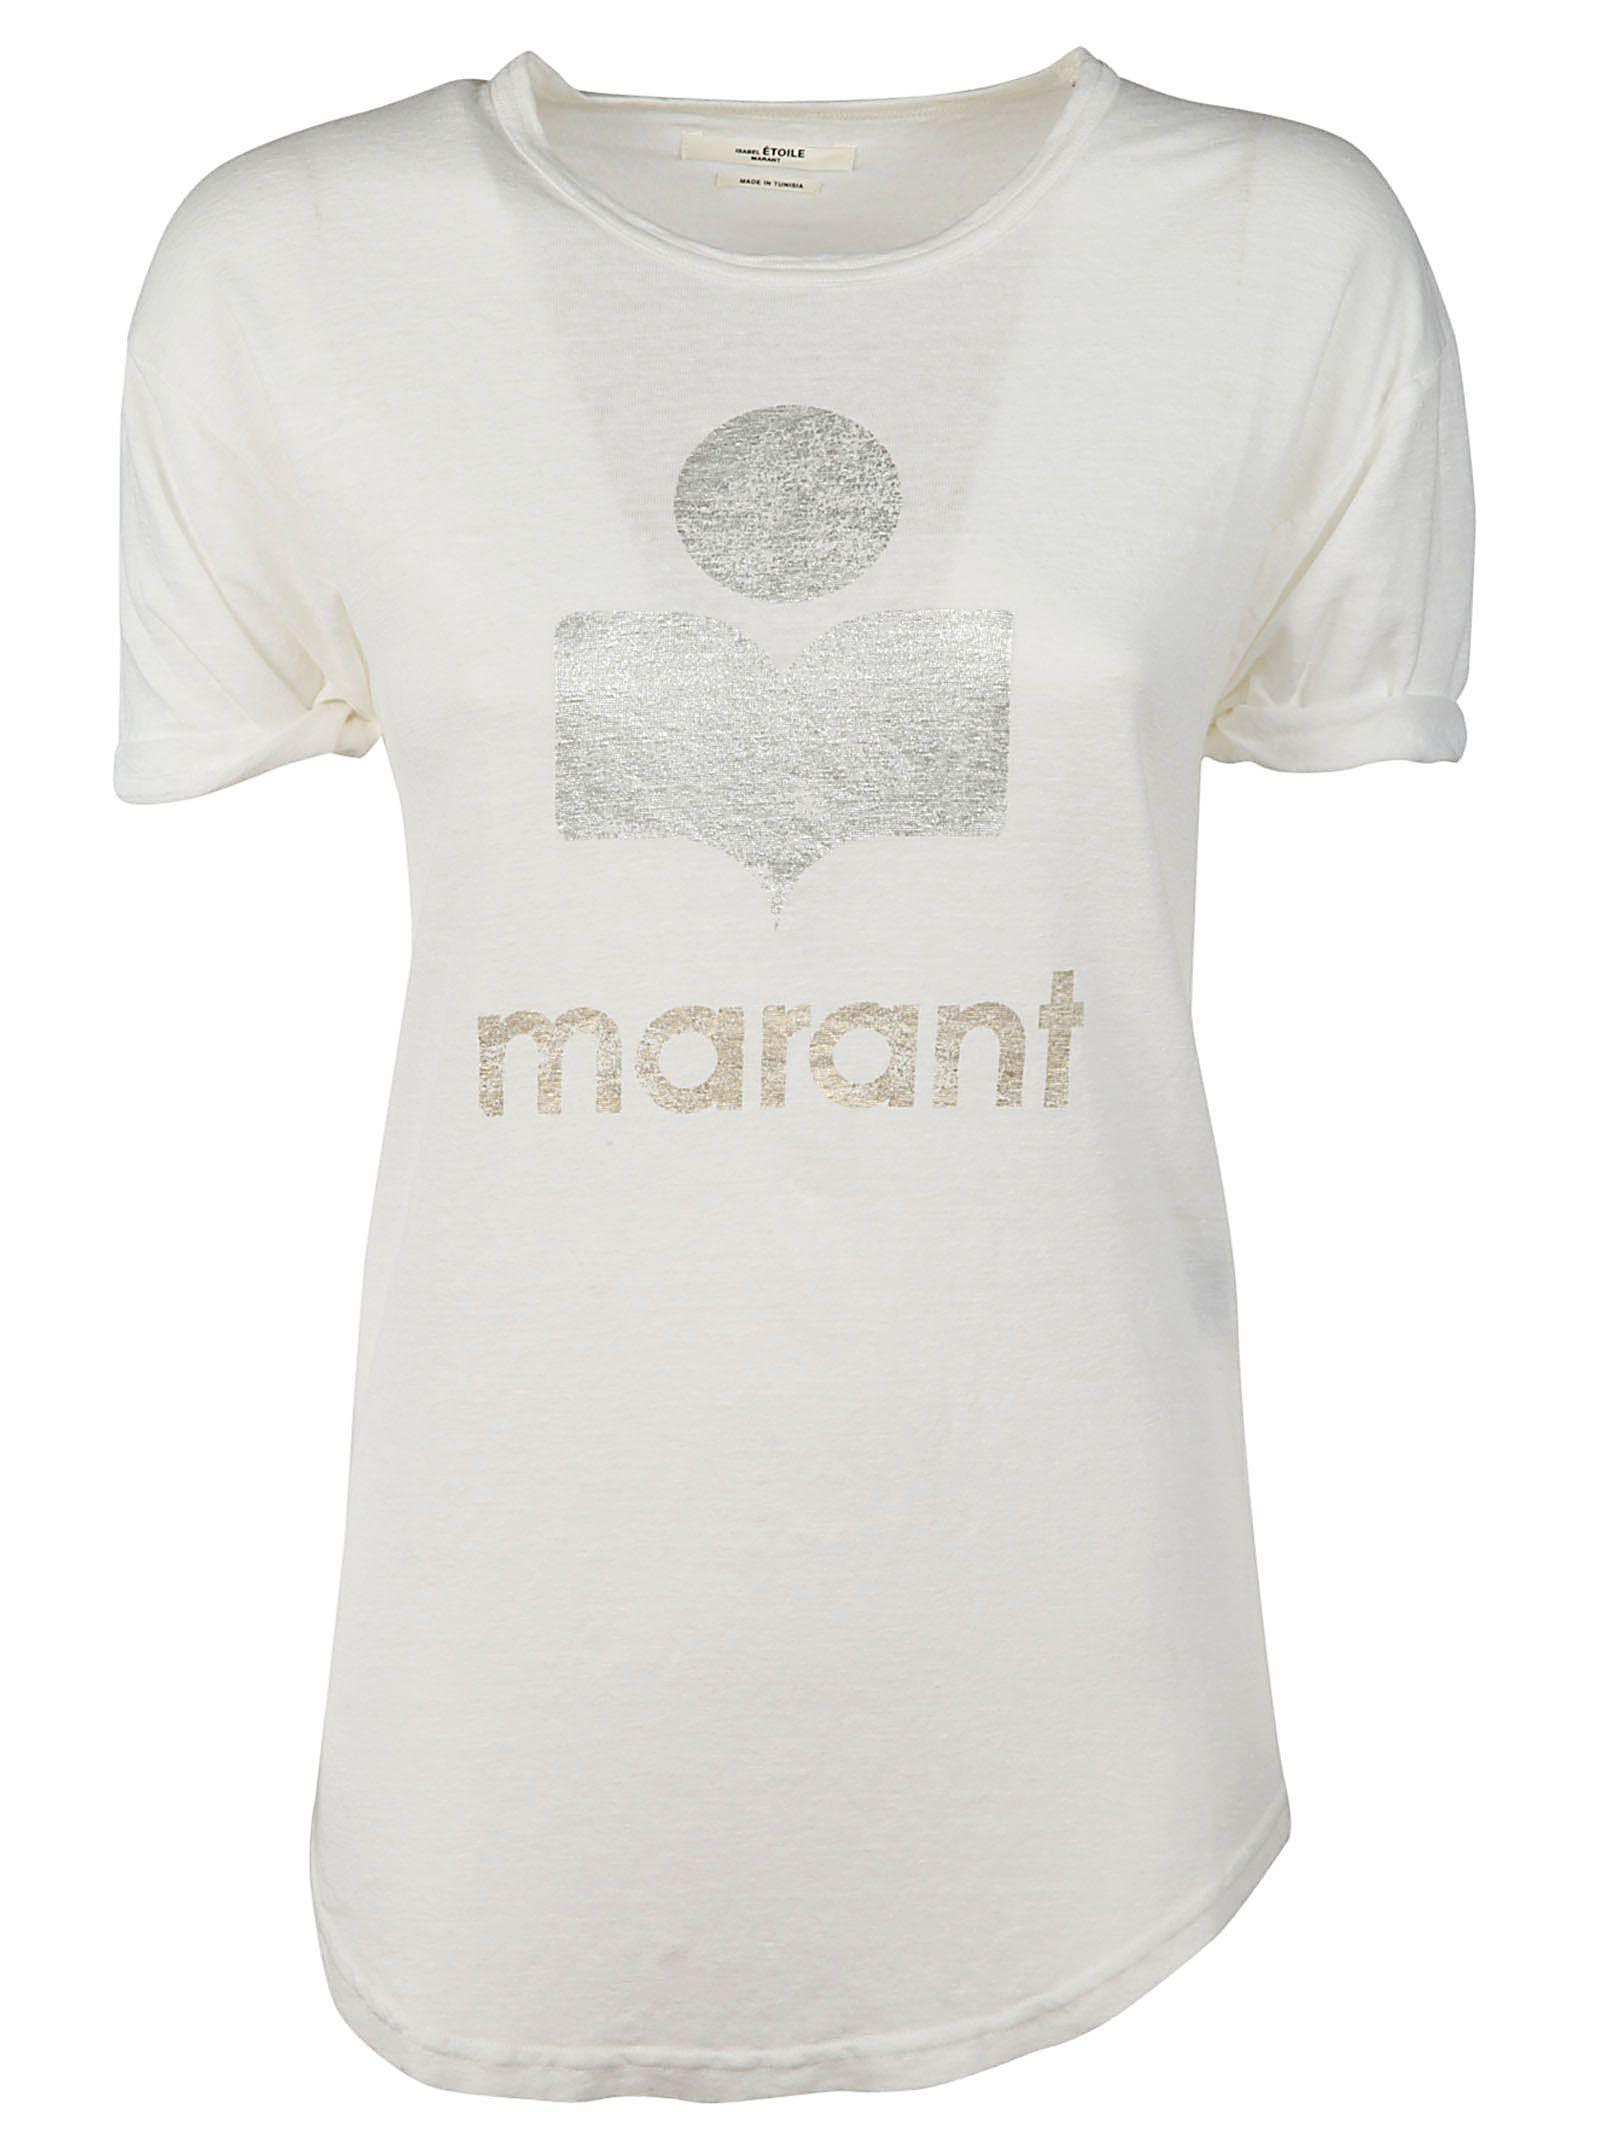 Isabel Marant ã Toile Printed T-shirt